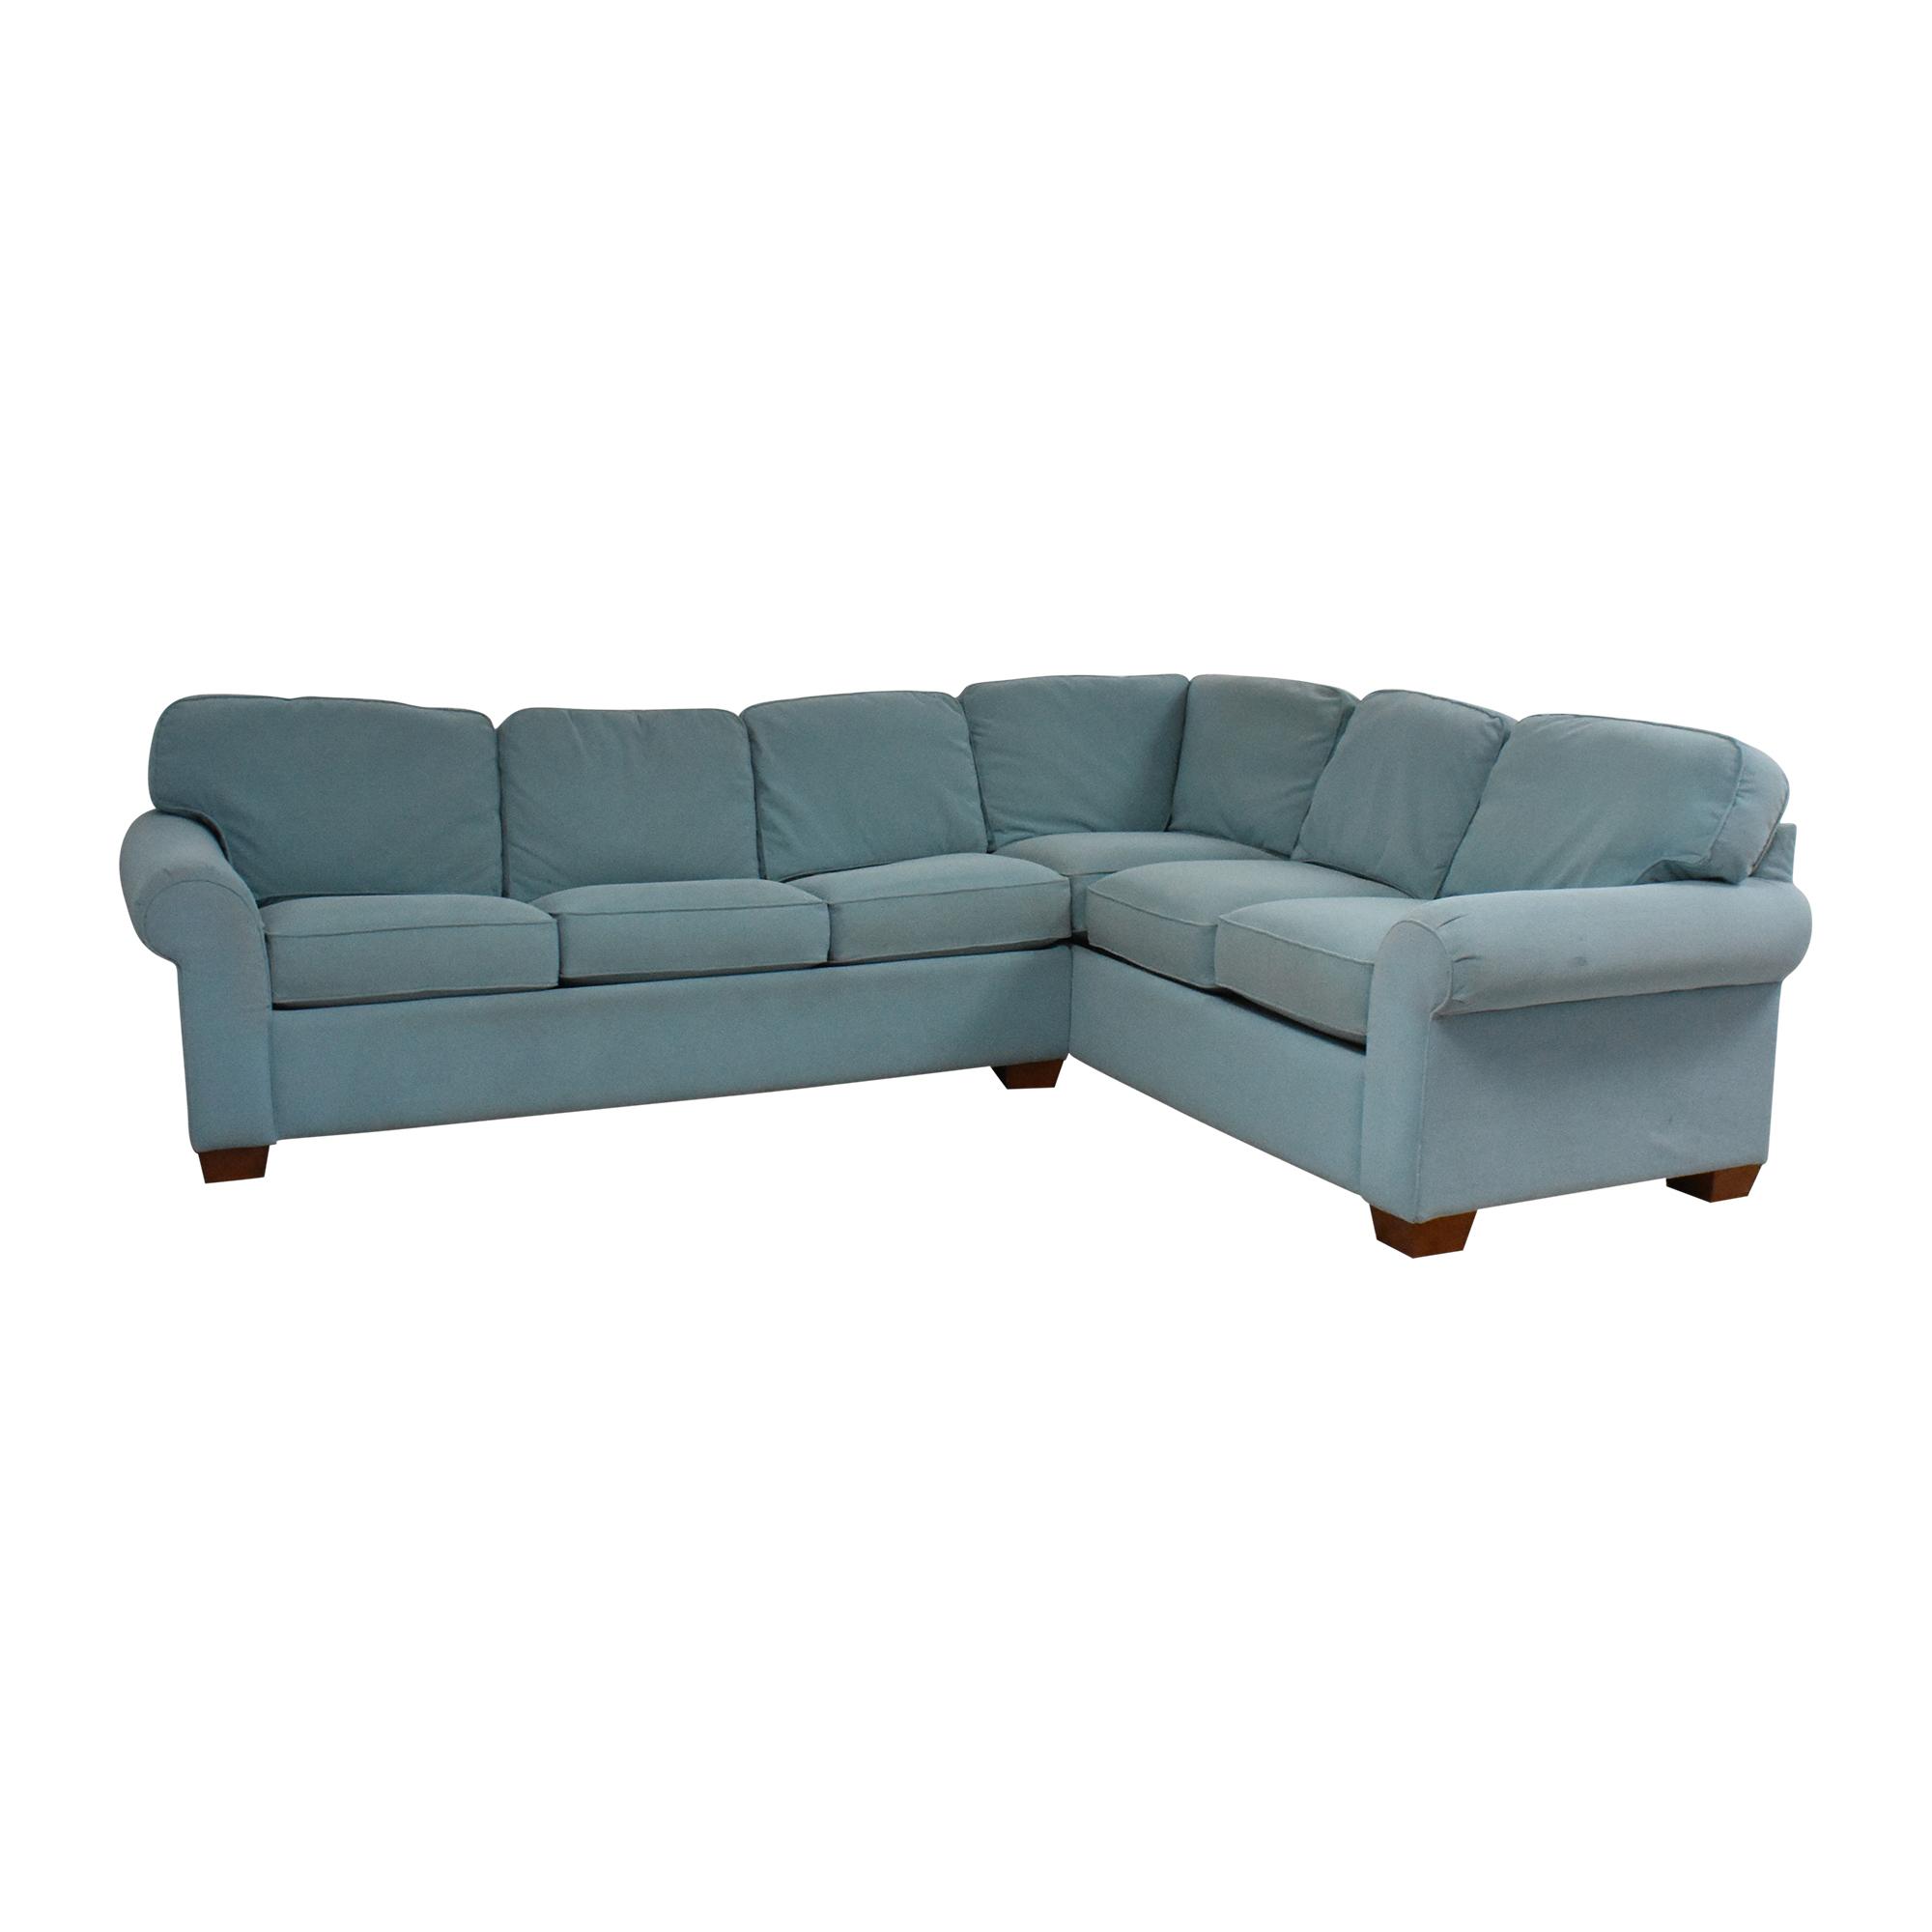 La-Z-Boy La-Z-Boy Corner Sectional Sleeper Sofa dimensions